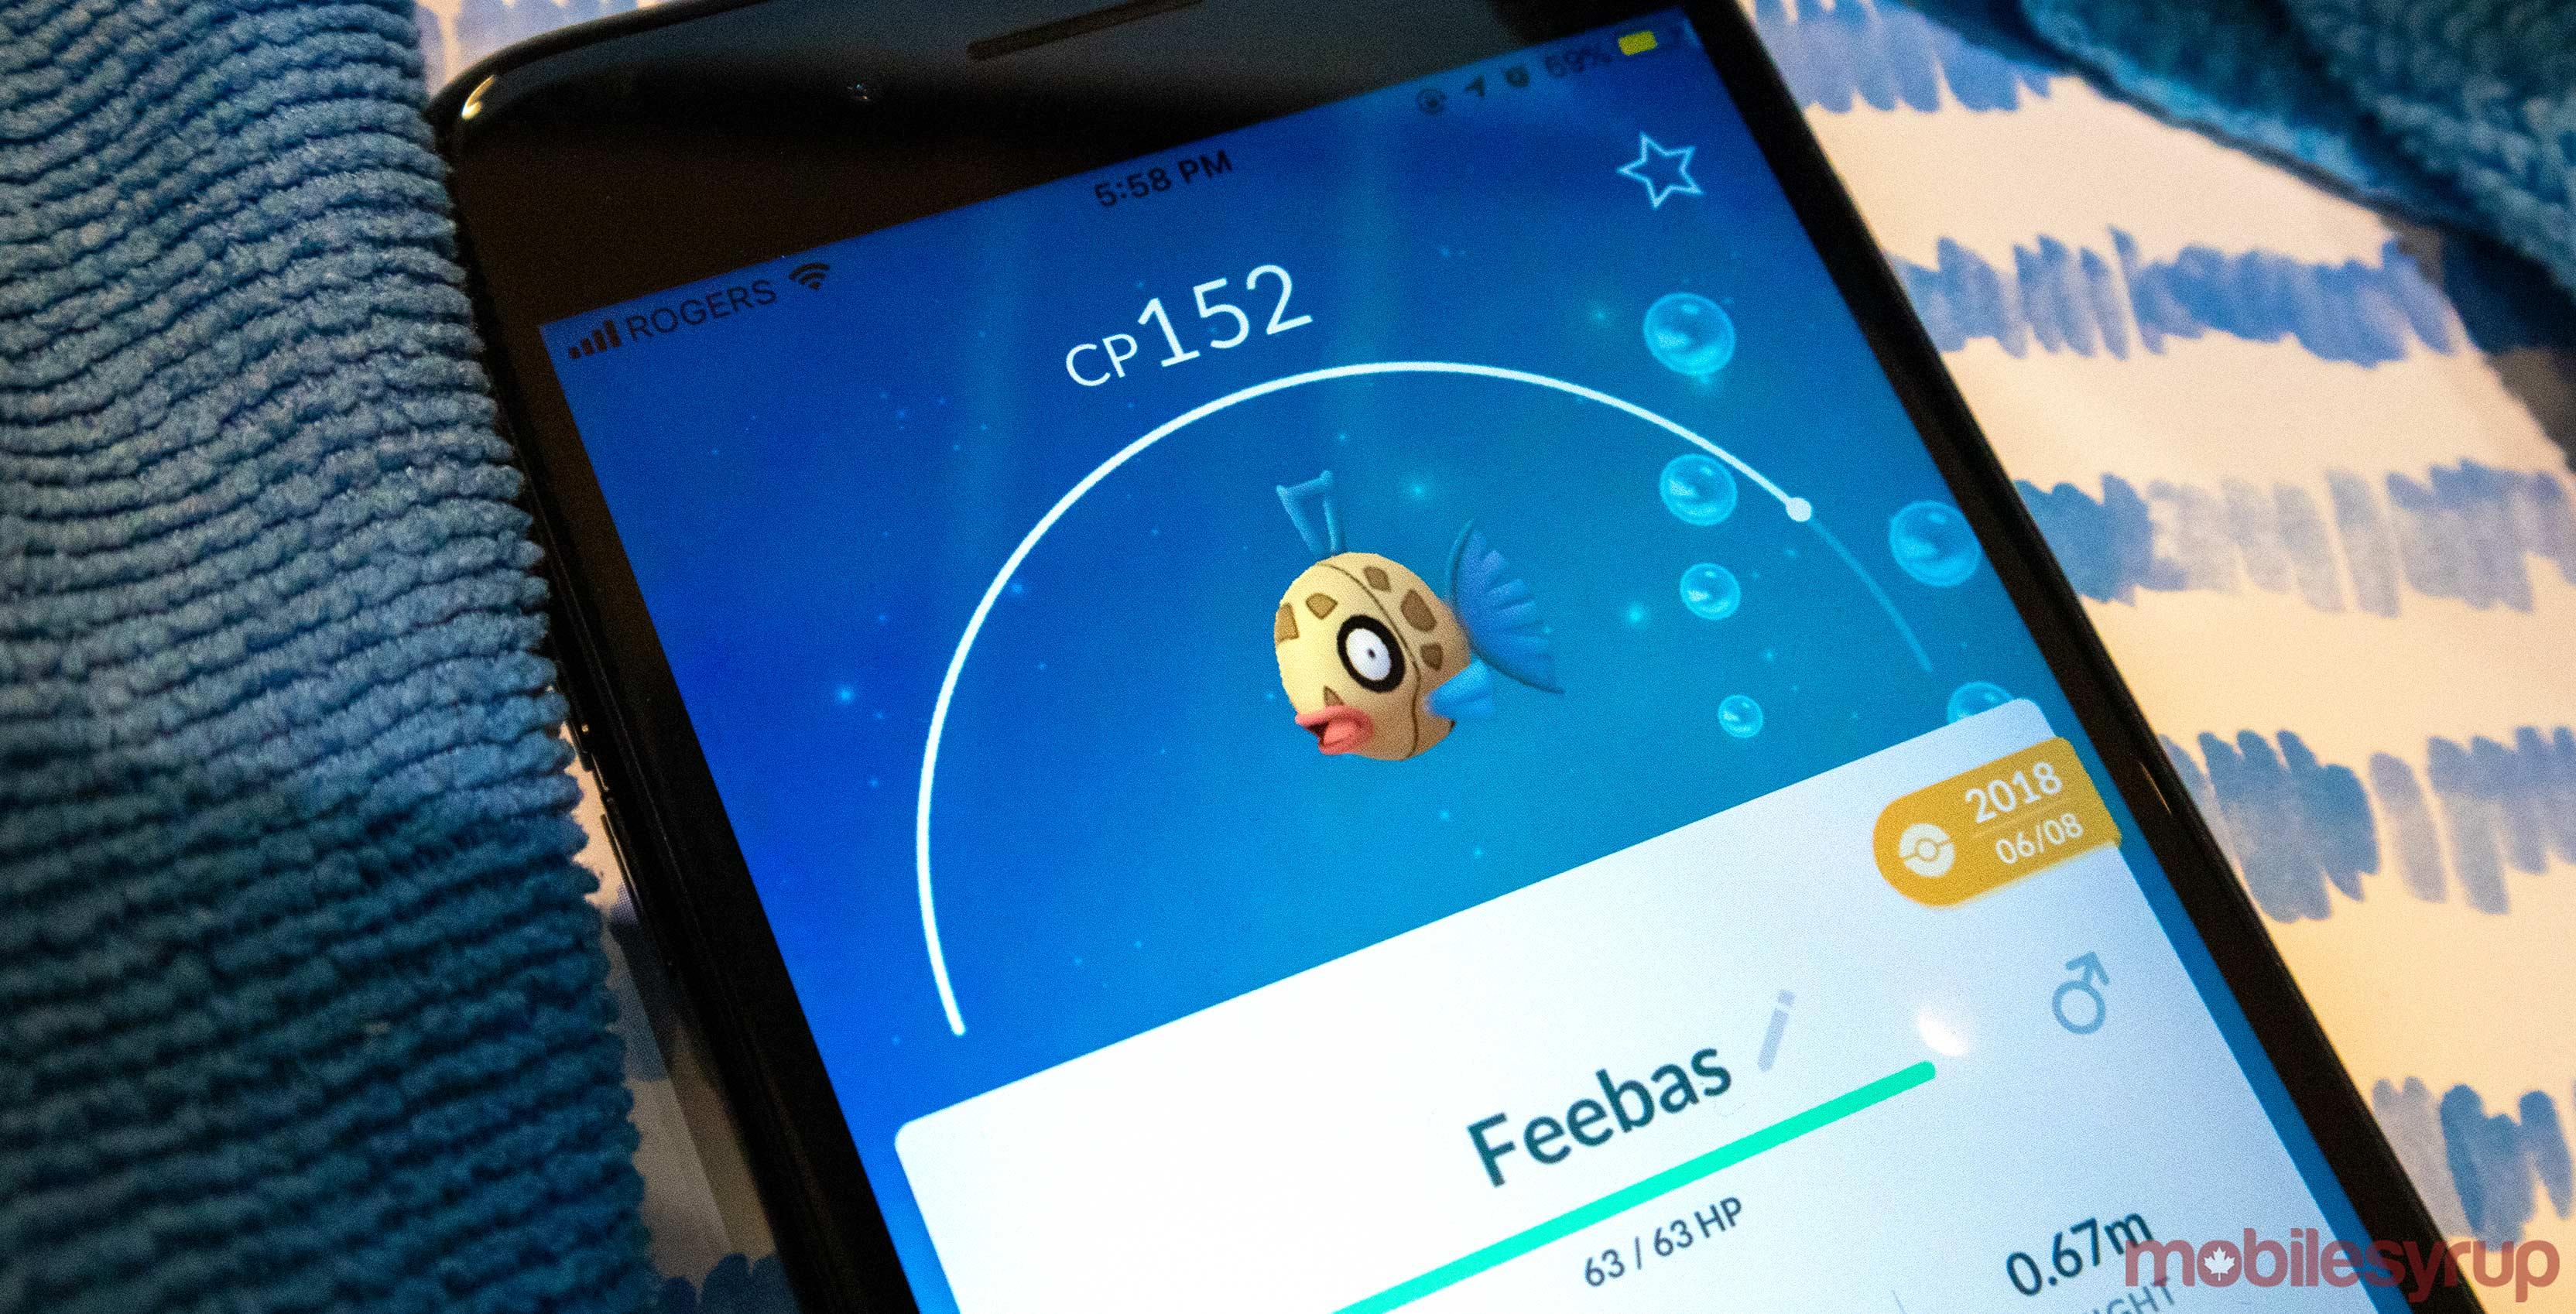 Pokémon Go Feebas